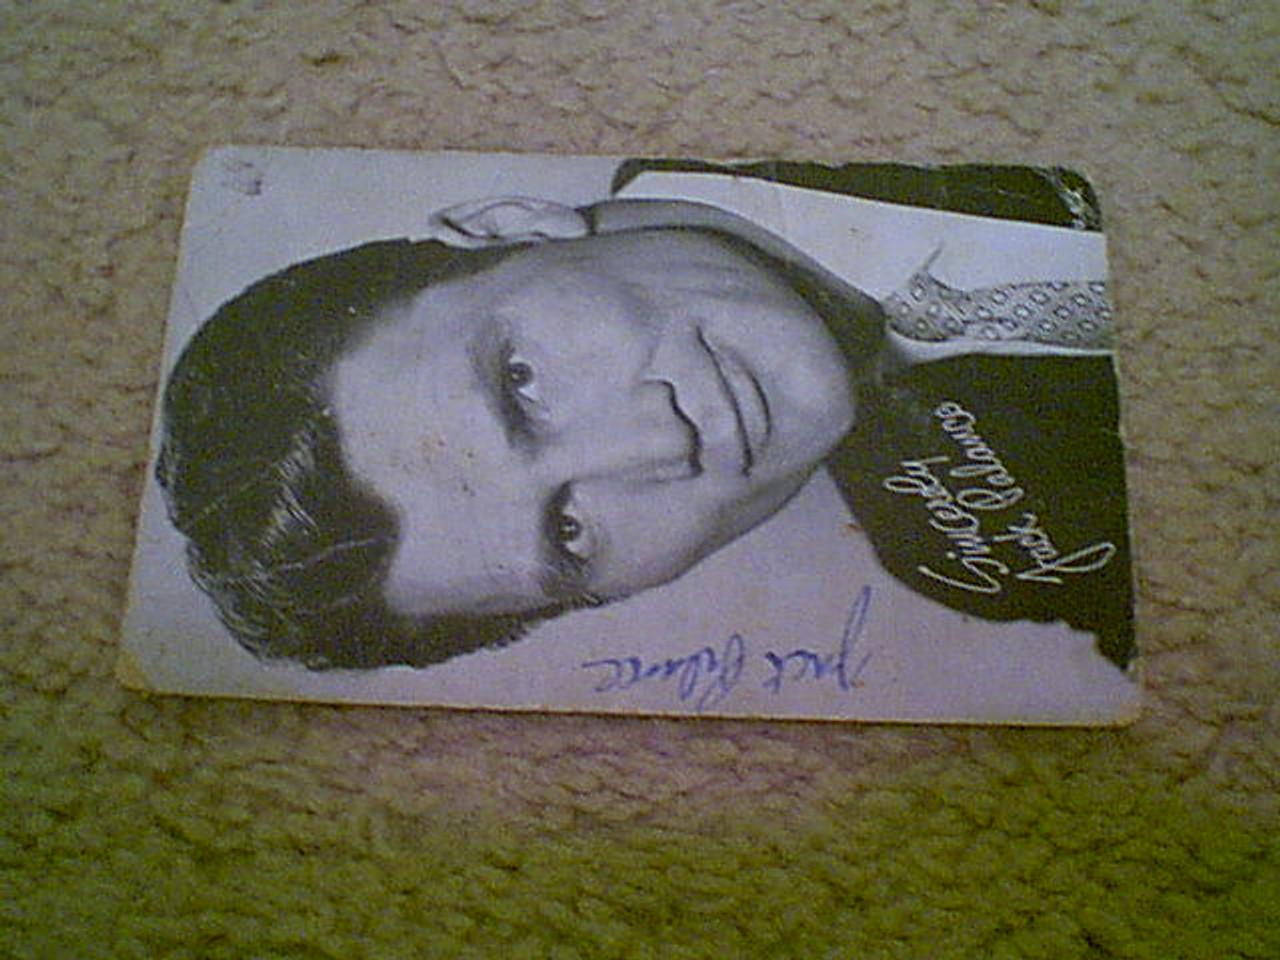 Palance, Jack 1960'S Fan Club Postcard Signed Autograph